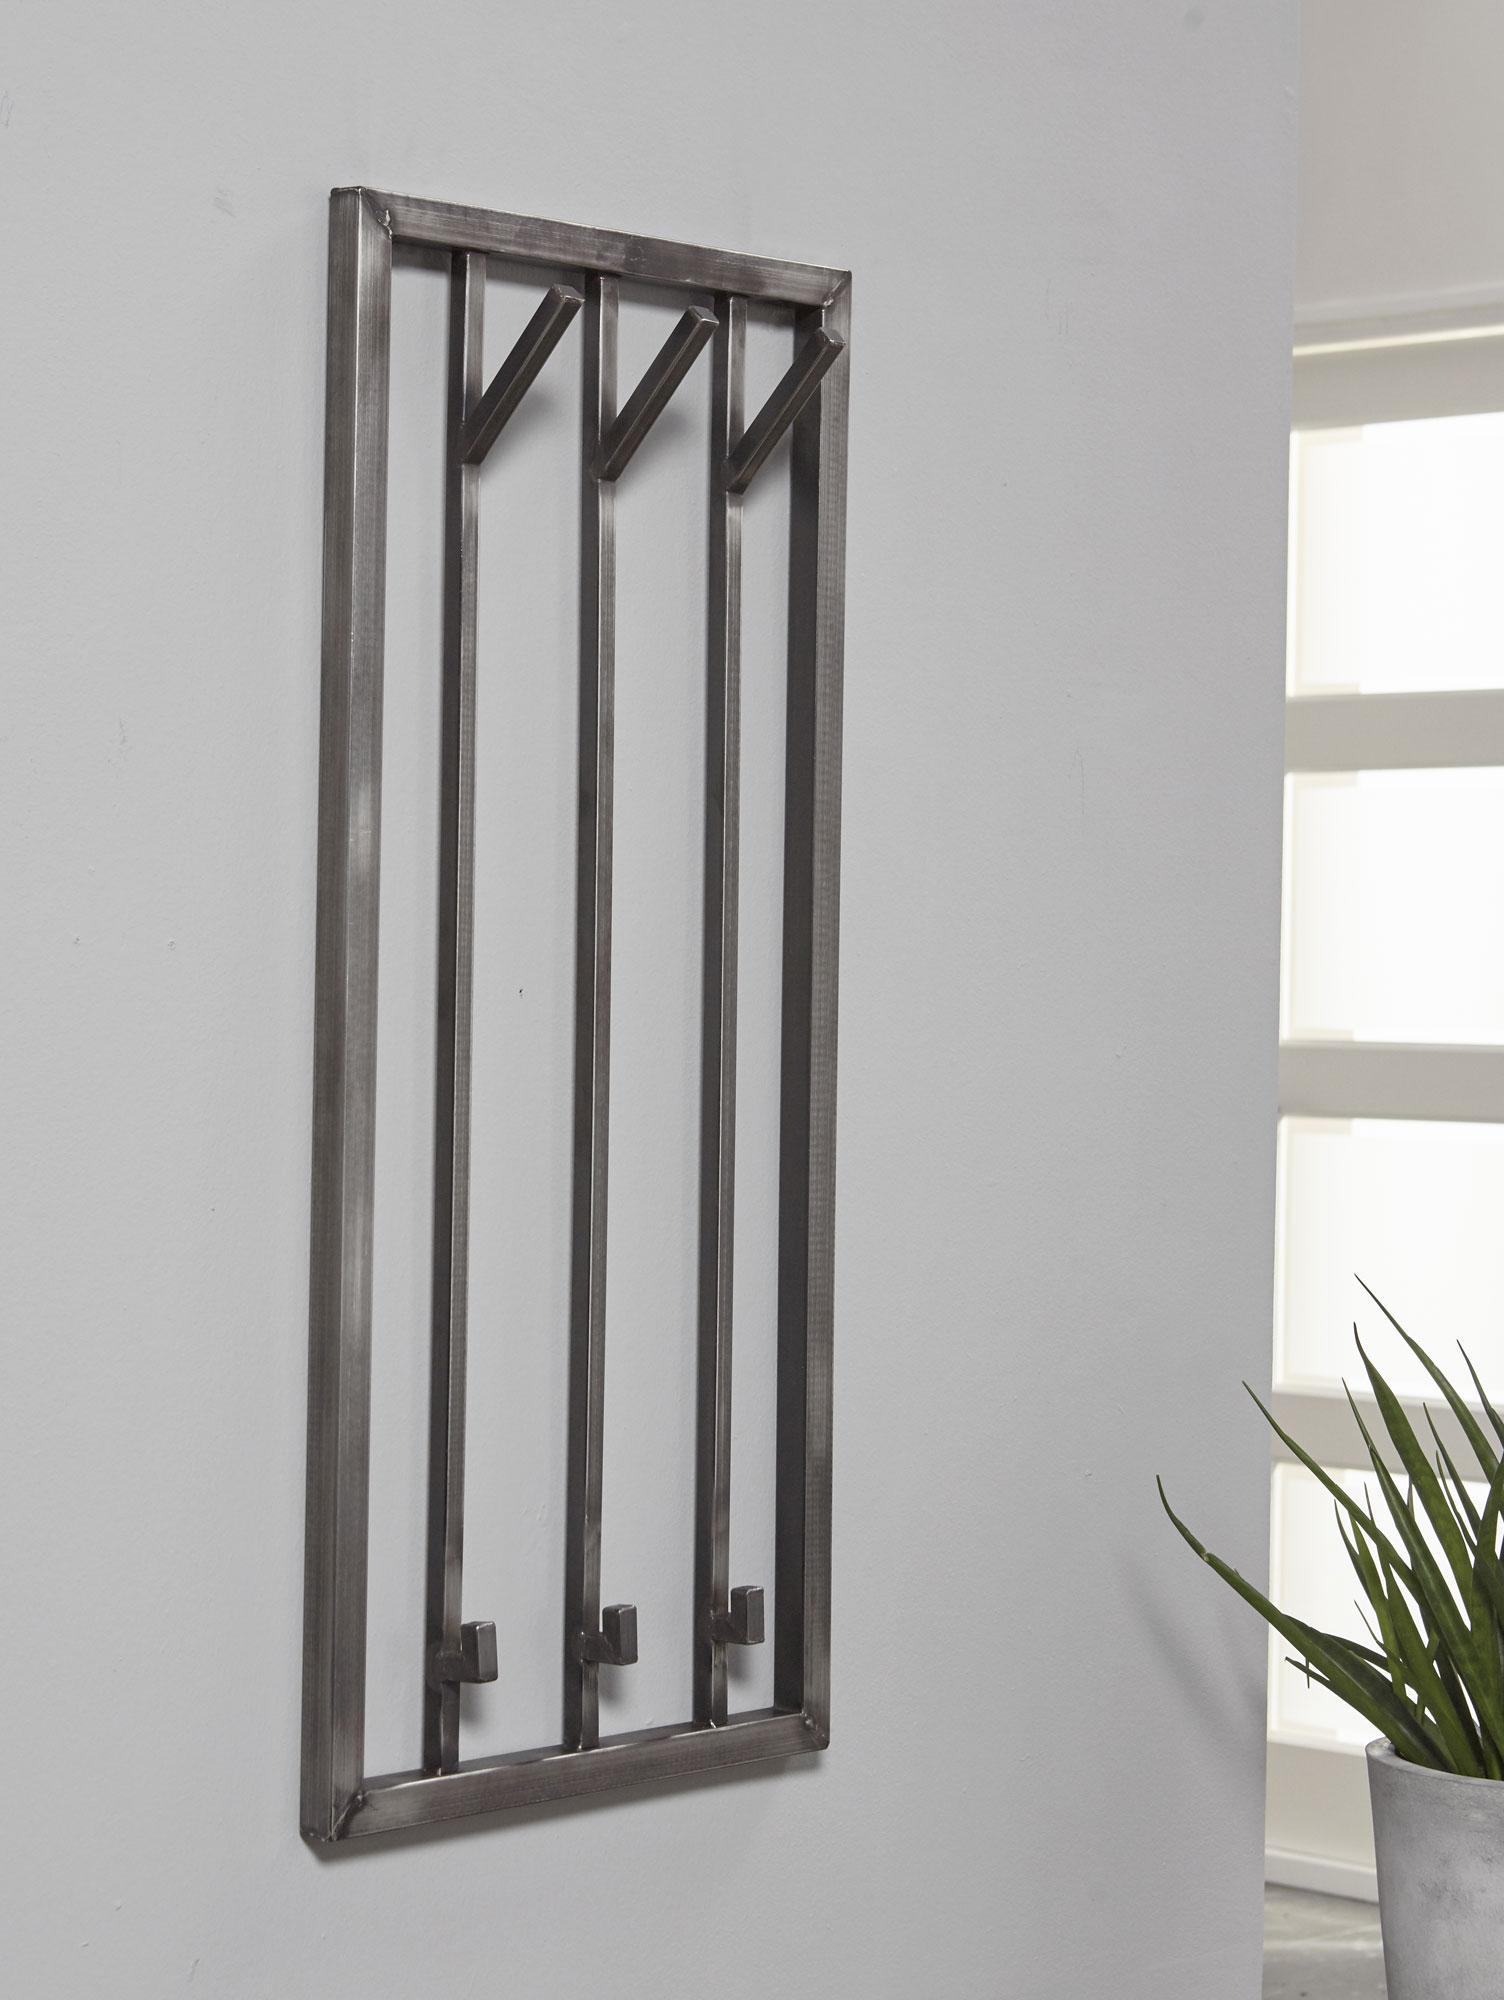 rode wandgarderobe edelstahl 39 5 cm 3 haken. Black Bedroom Furniture Sets. Home Design Ideas